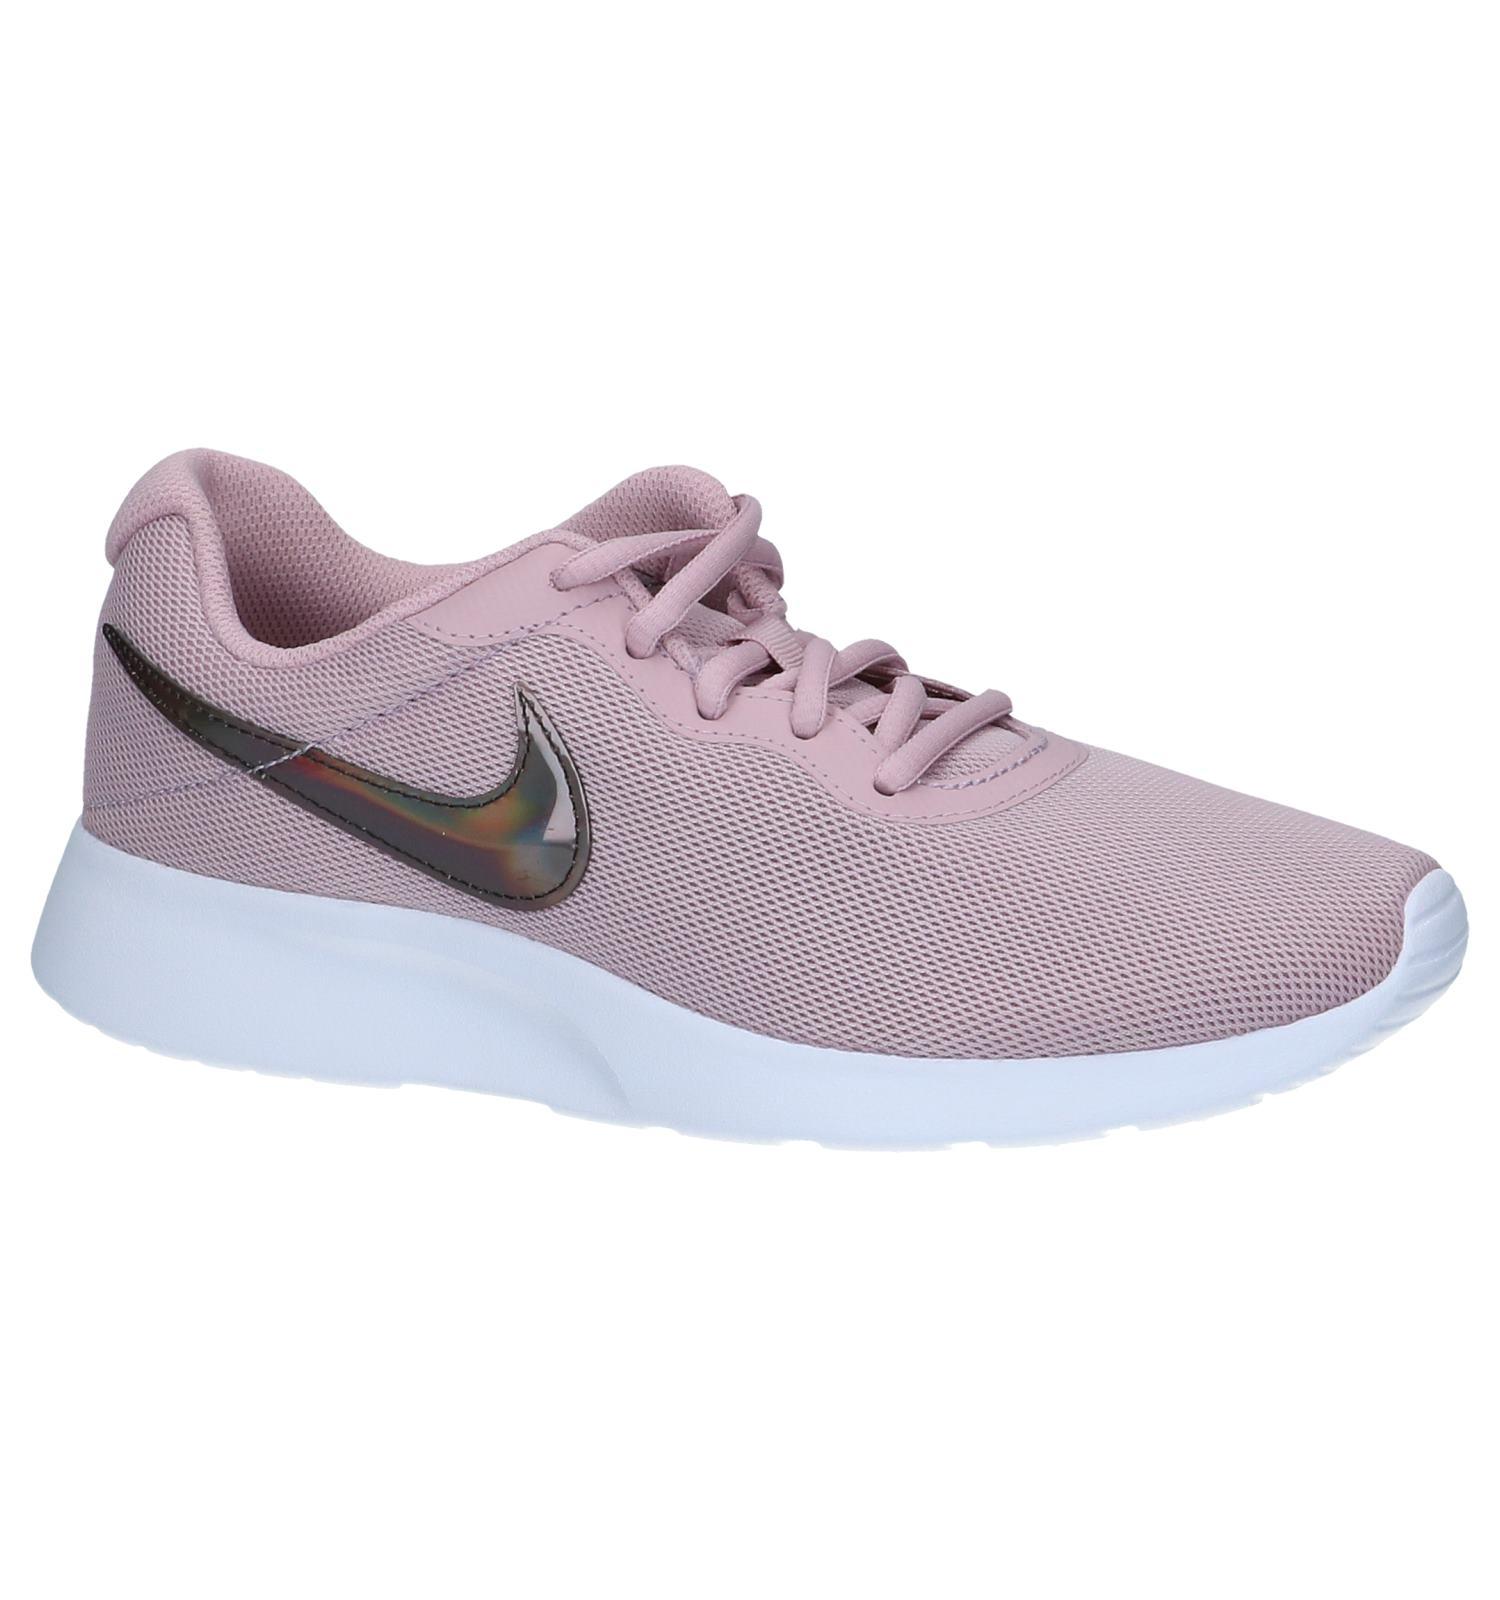 55794ee9ab1 Roze Sneakers Nike Tanjun | TORFS.BE | Gratis verzend en retour